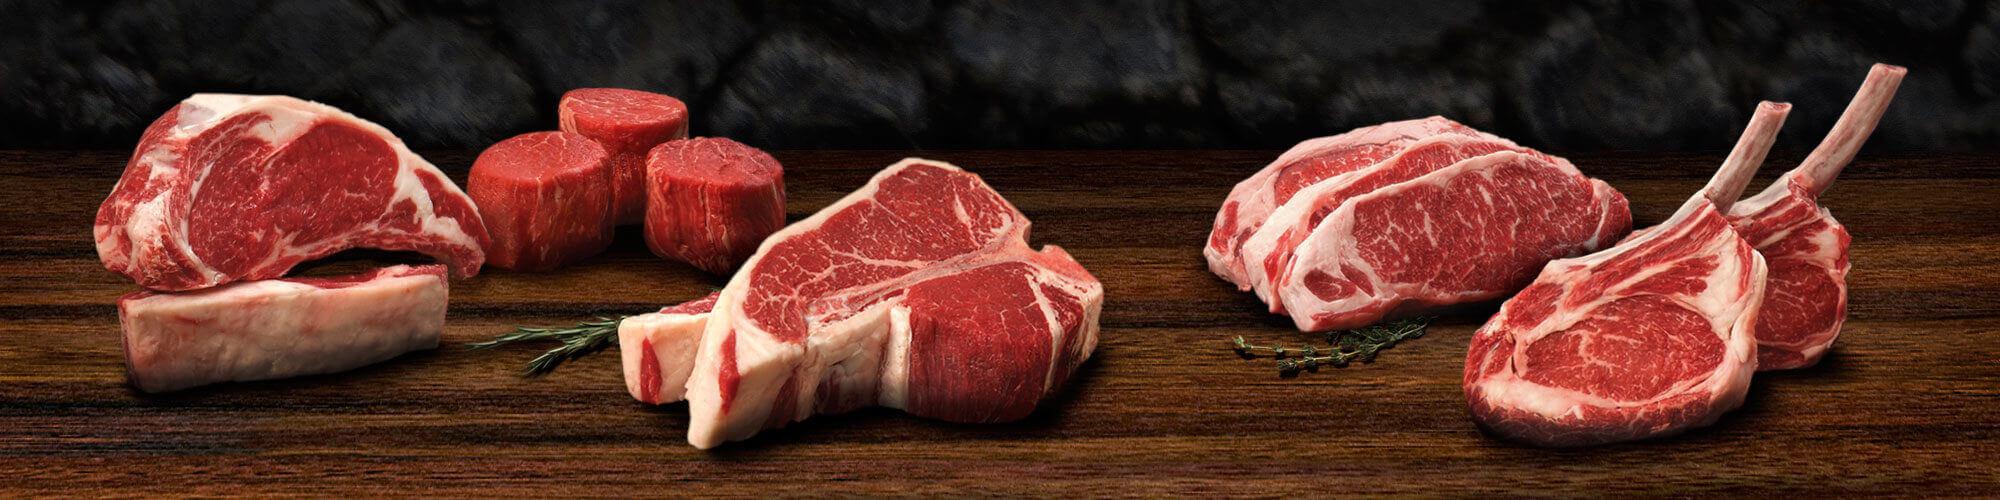 Skirt Steak Certified Angus Beef 174 Brand Angus Beef At